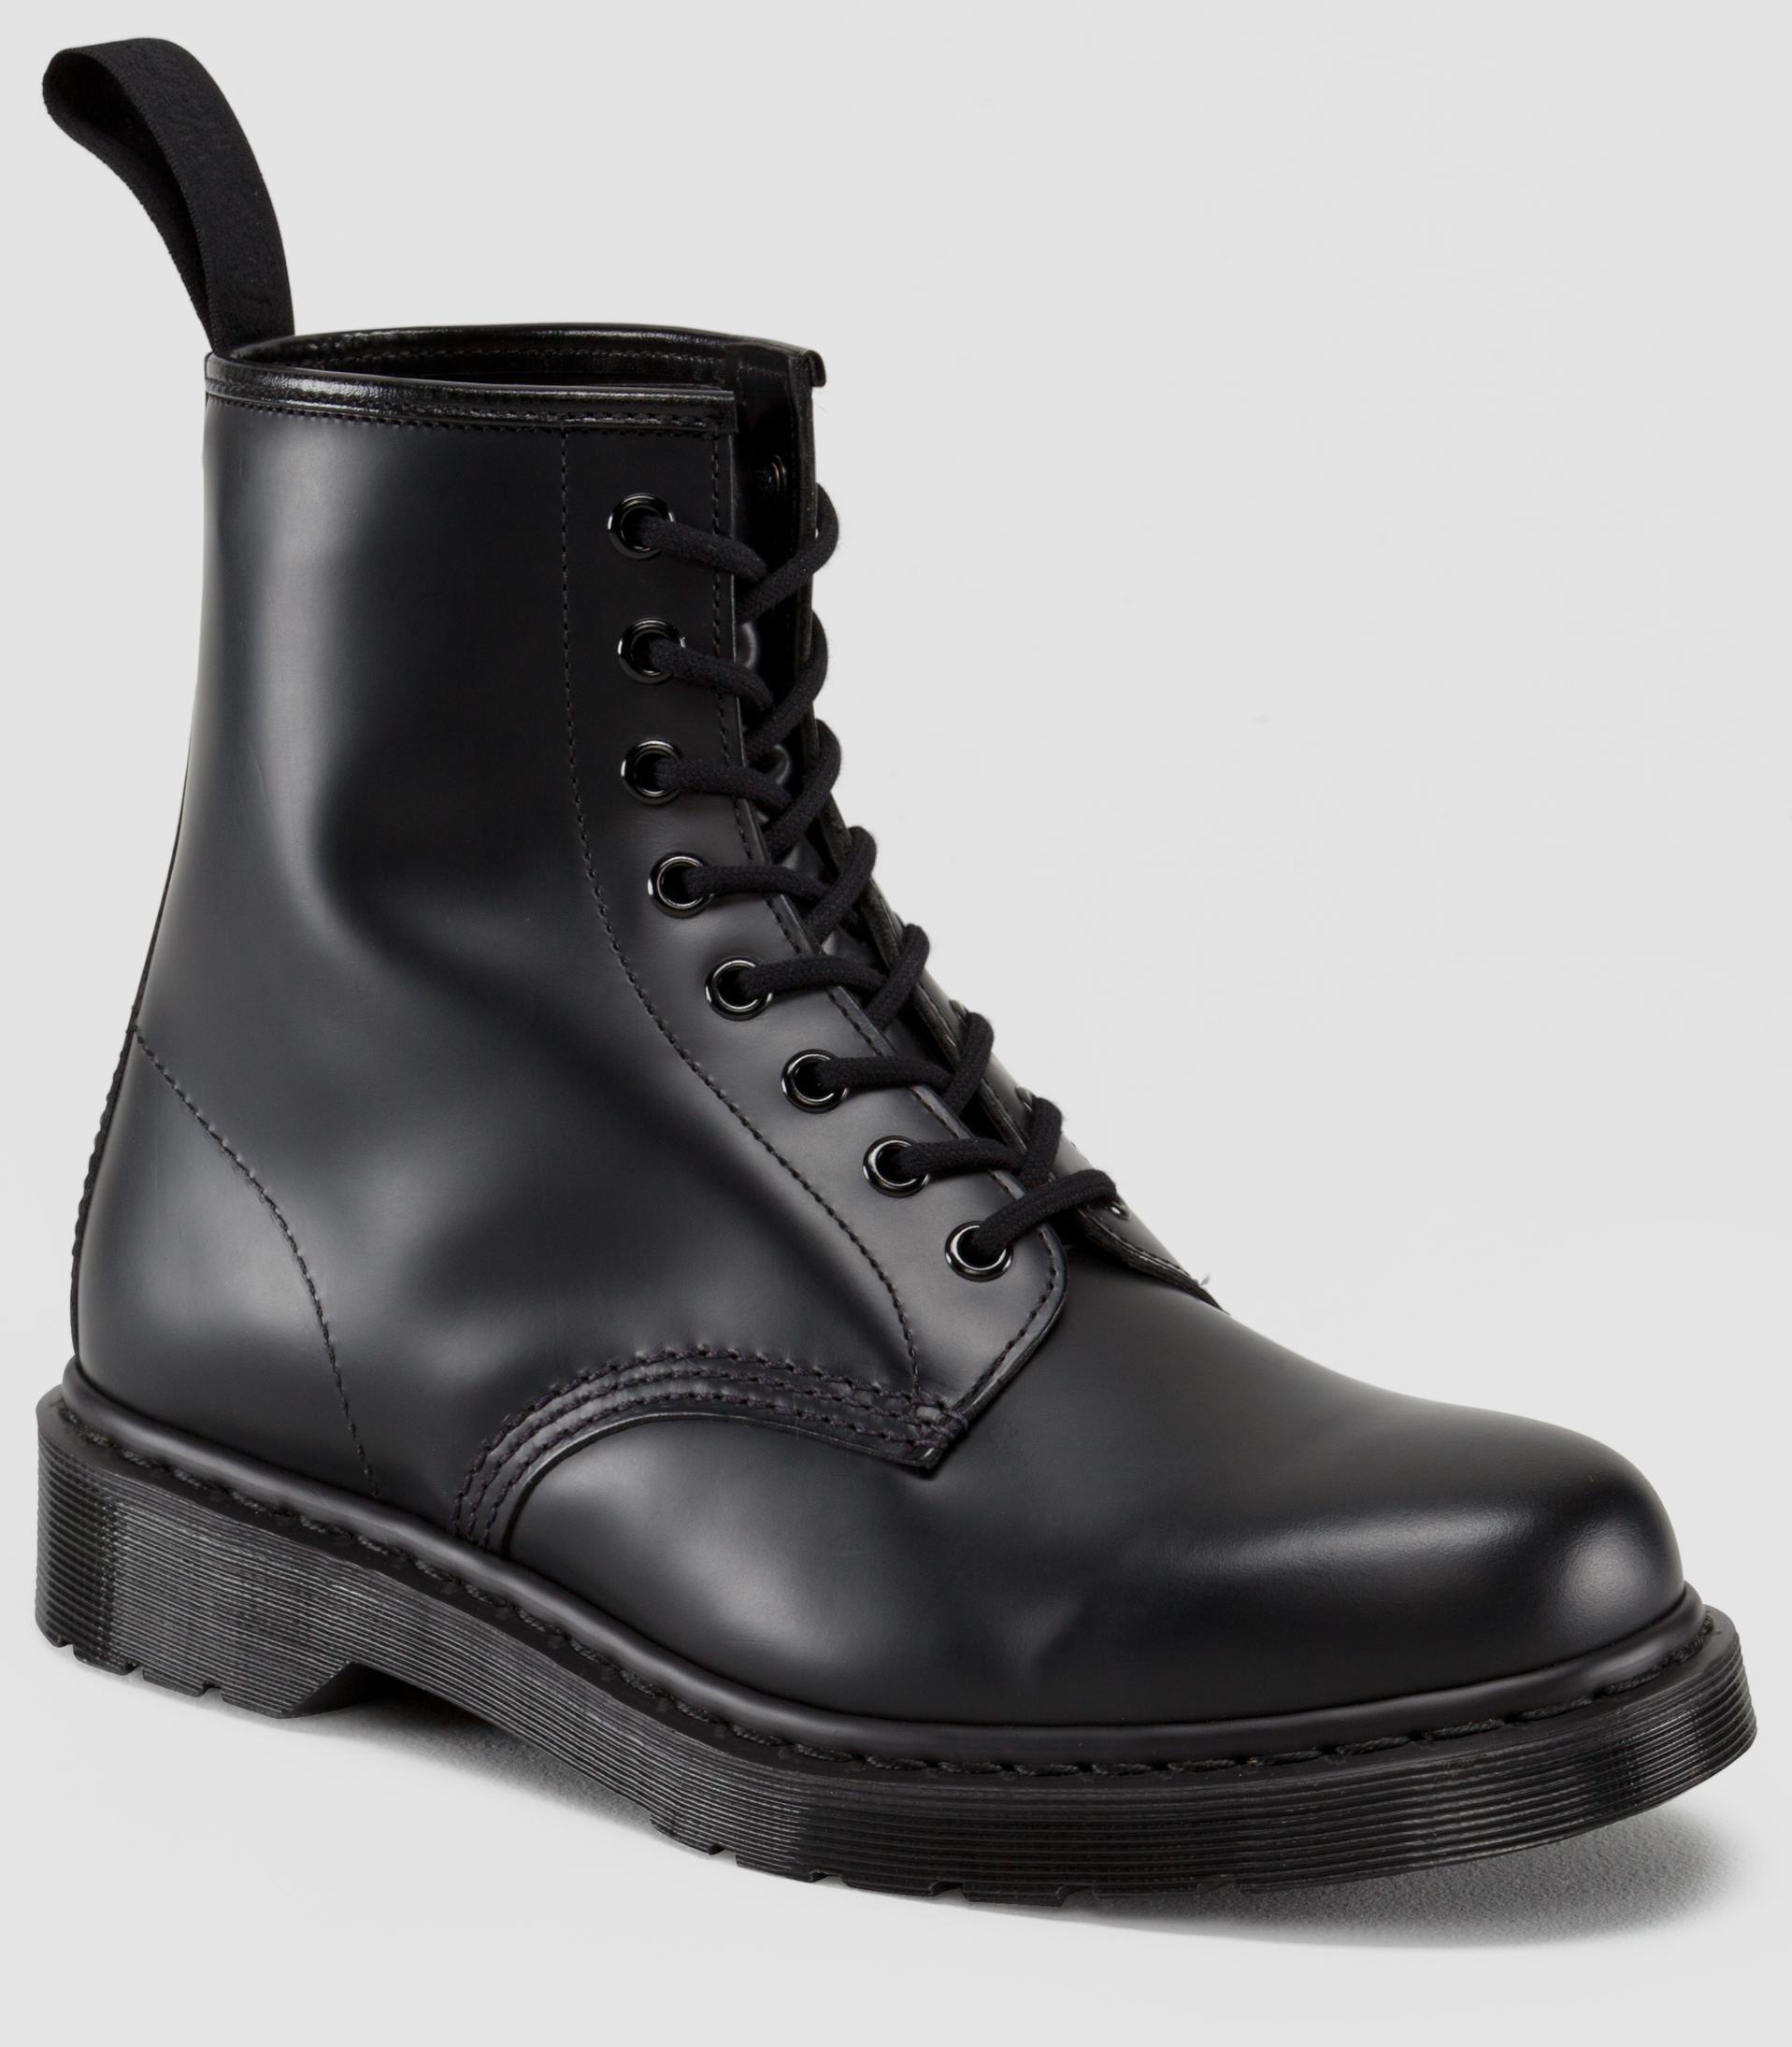 1460 mono 1460 8 eye boots official dr martens store us. Black Bedroom Furniture Sets. Home Design Ideas